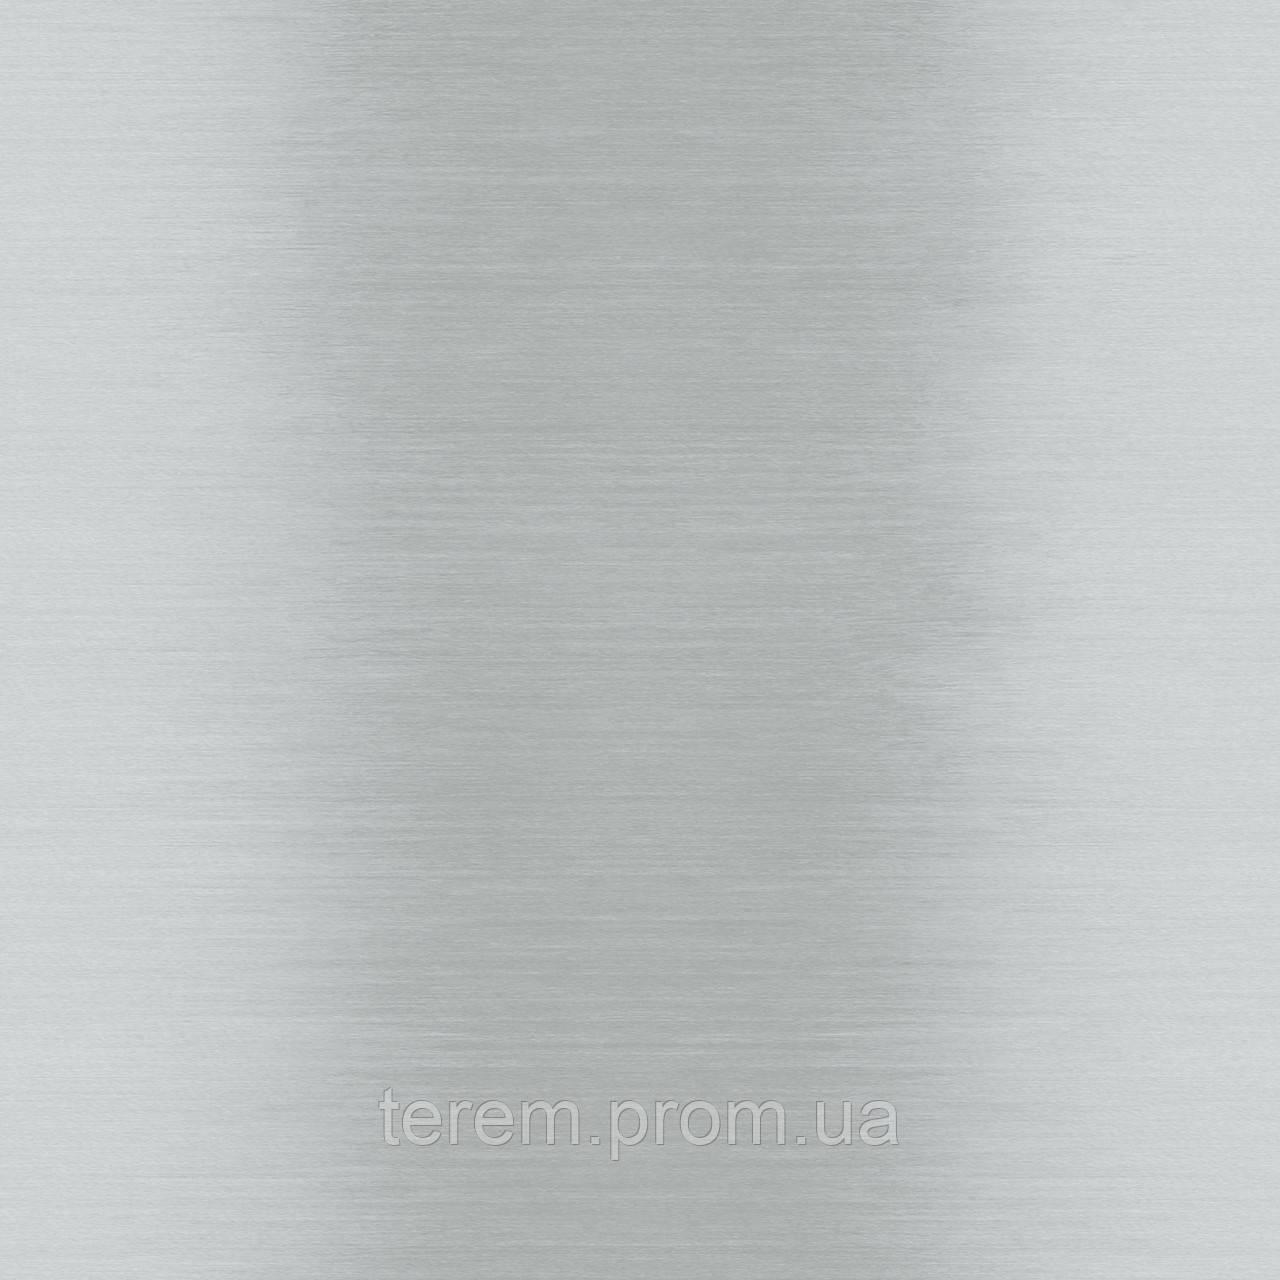 Vignette stripe grey